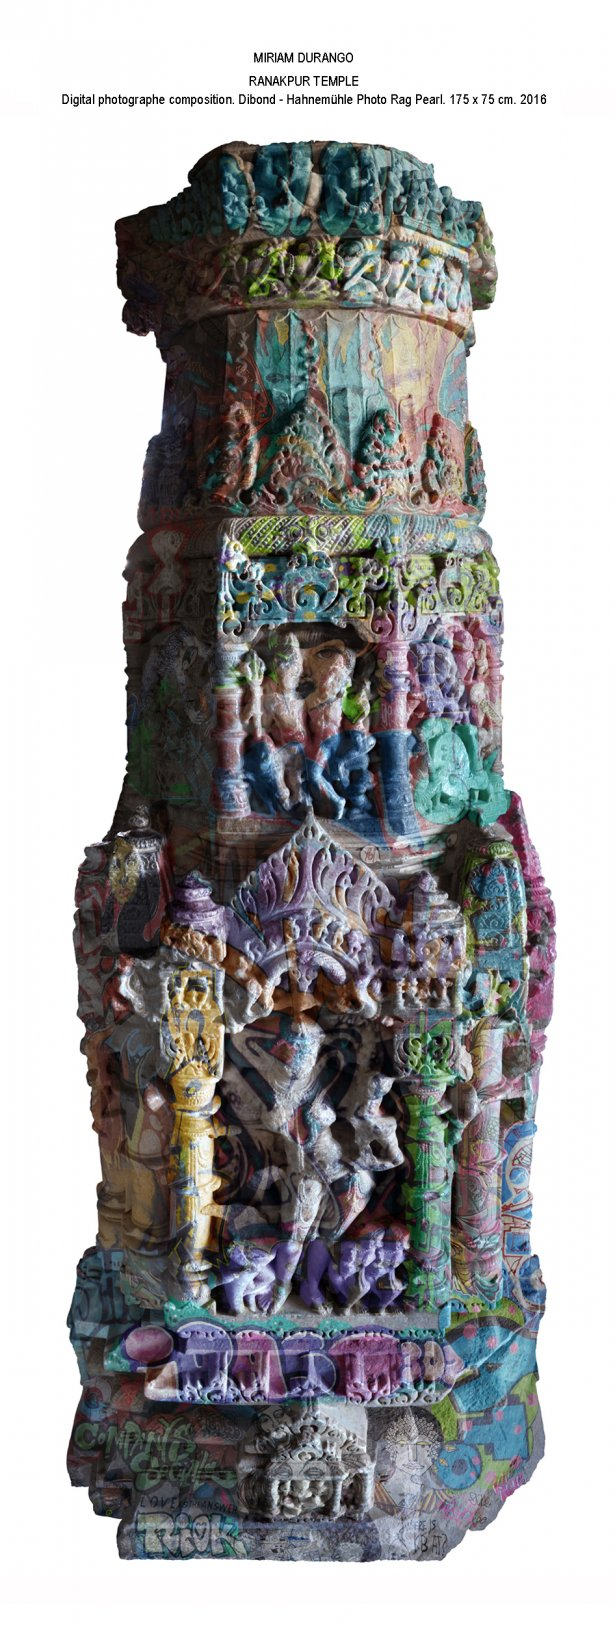 Templo de Ranakpur (2016) - Miriam Durango